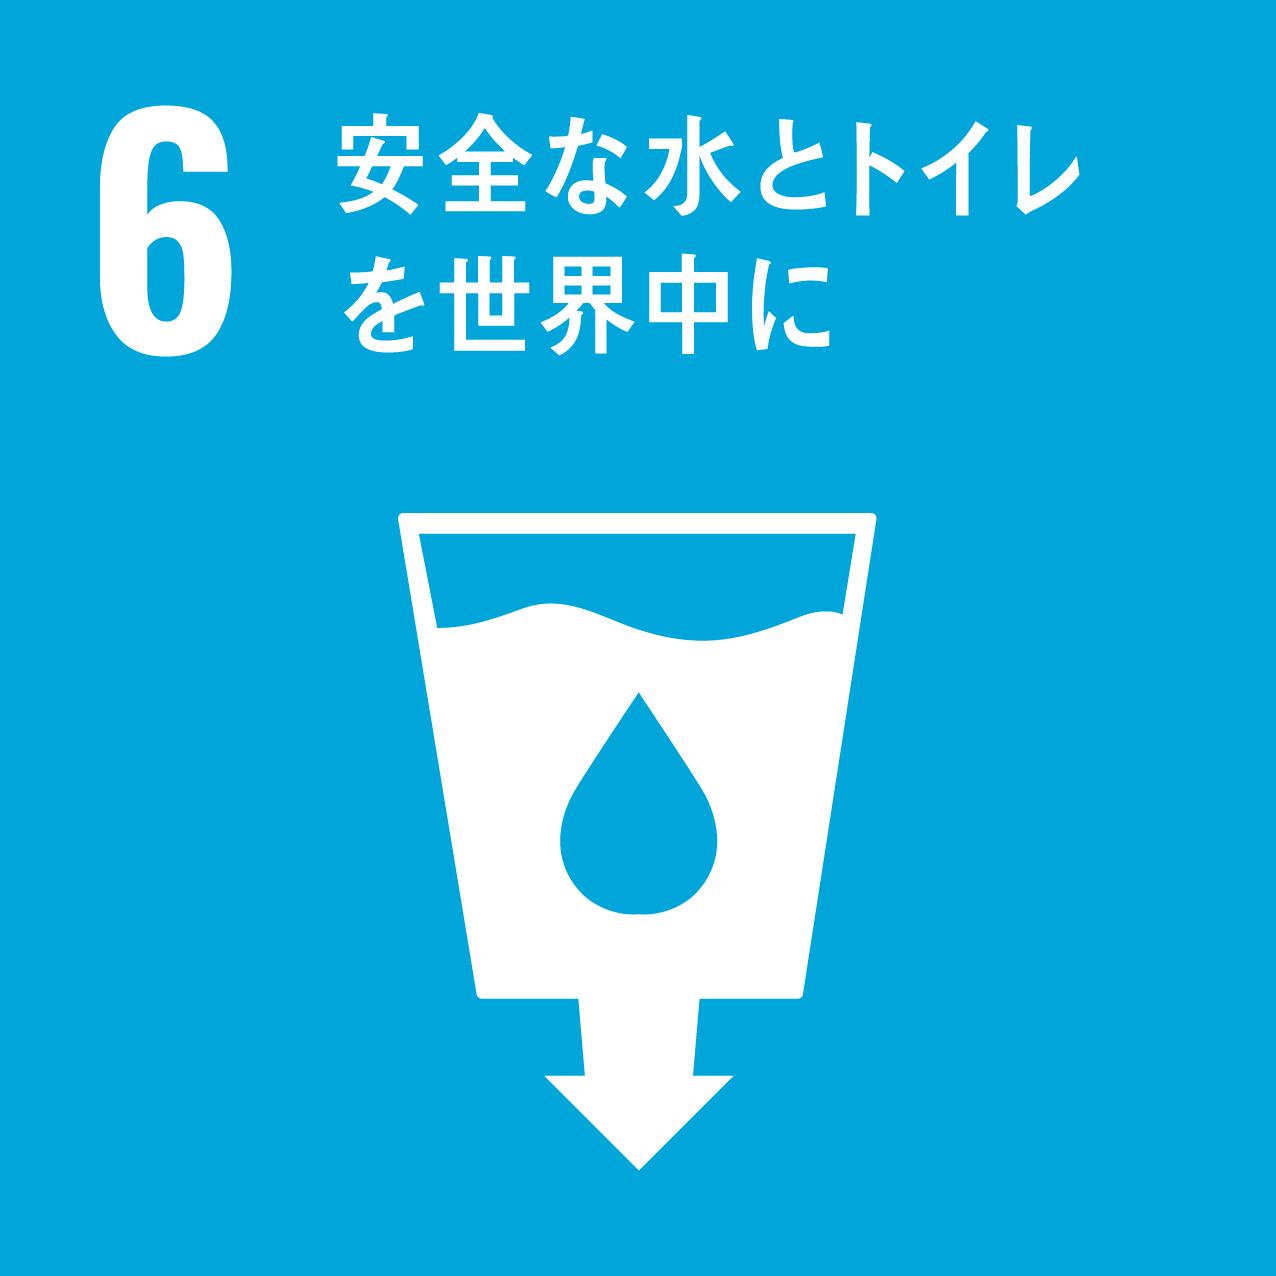 SDGs目標アイコン 6.安全な水とトイレを世界中に